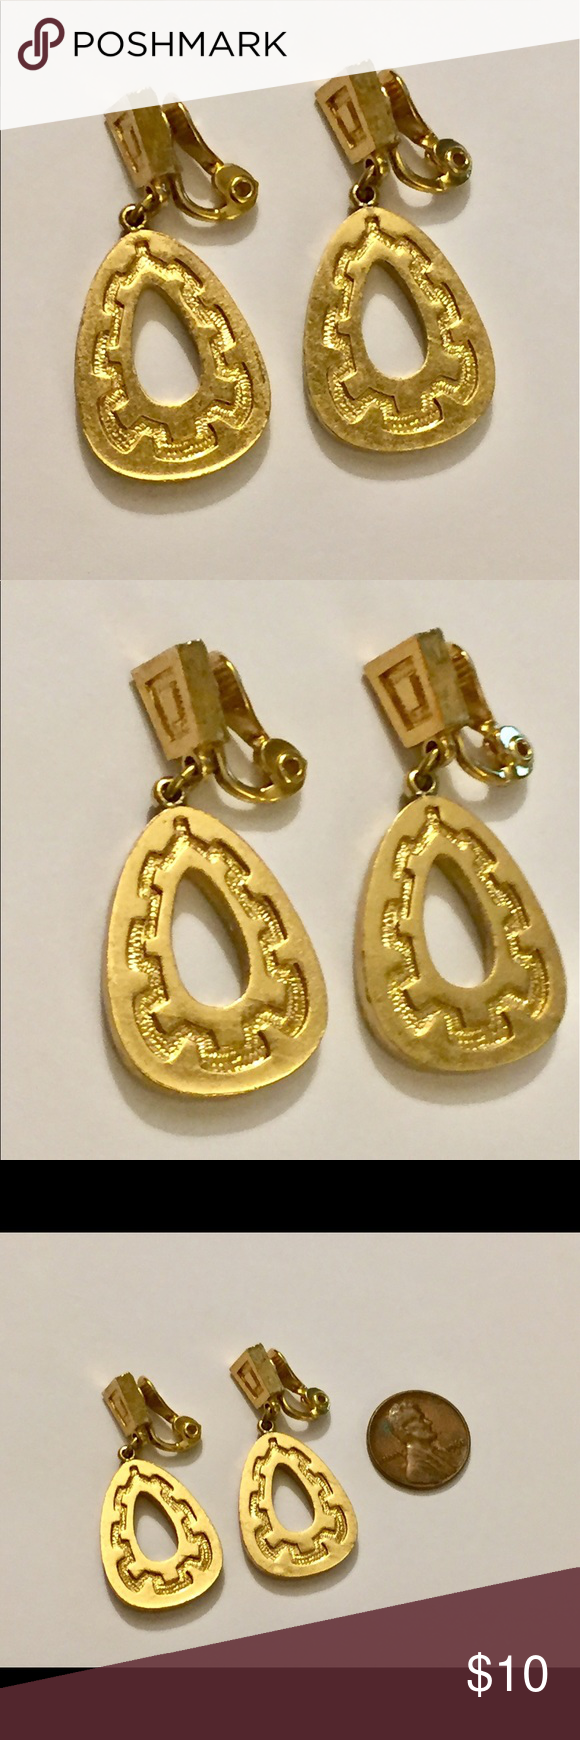 Vintage MONET Dangle earrings clip on Great condition Vintage Jewelry Earrings